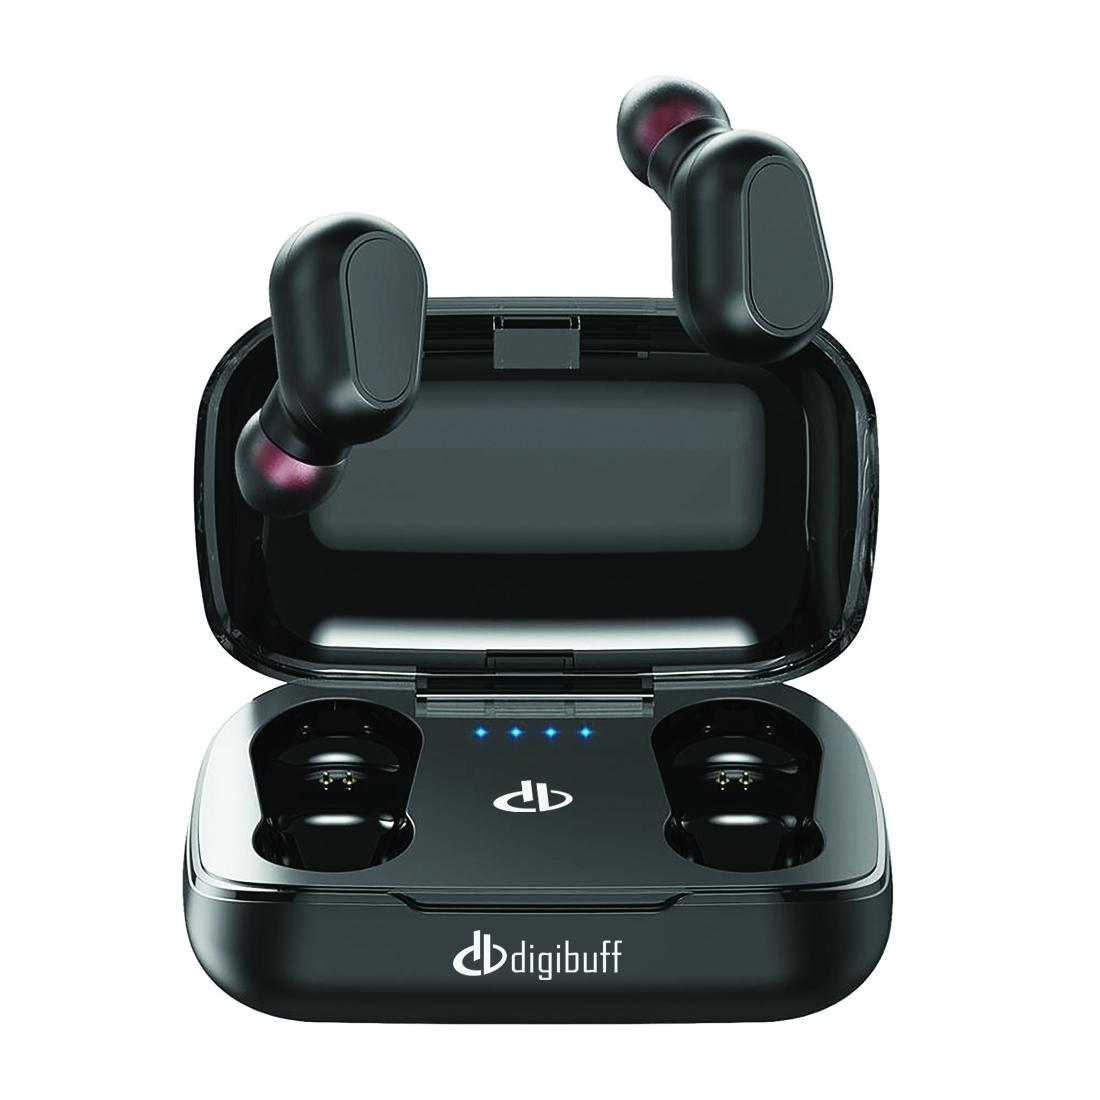 Digibuff L21TWS Digipods Wireless Earphones Bluetooth 5.0 Headphones Mini Stereo Earbuds Sport Headset Bass Sound